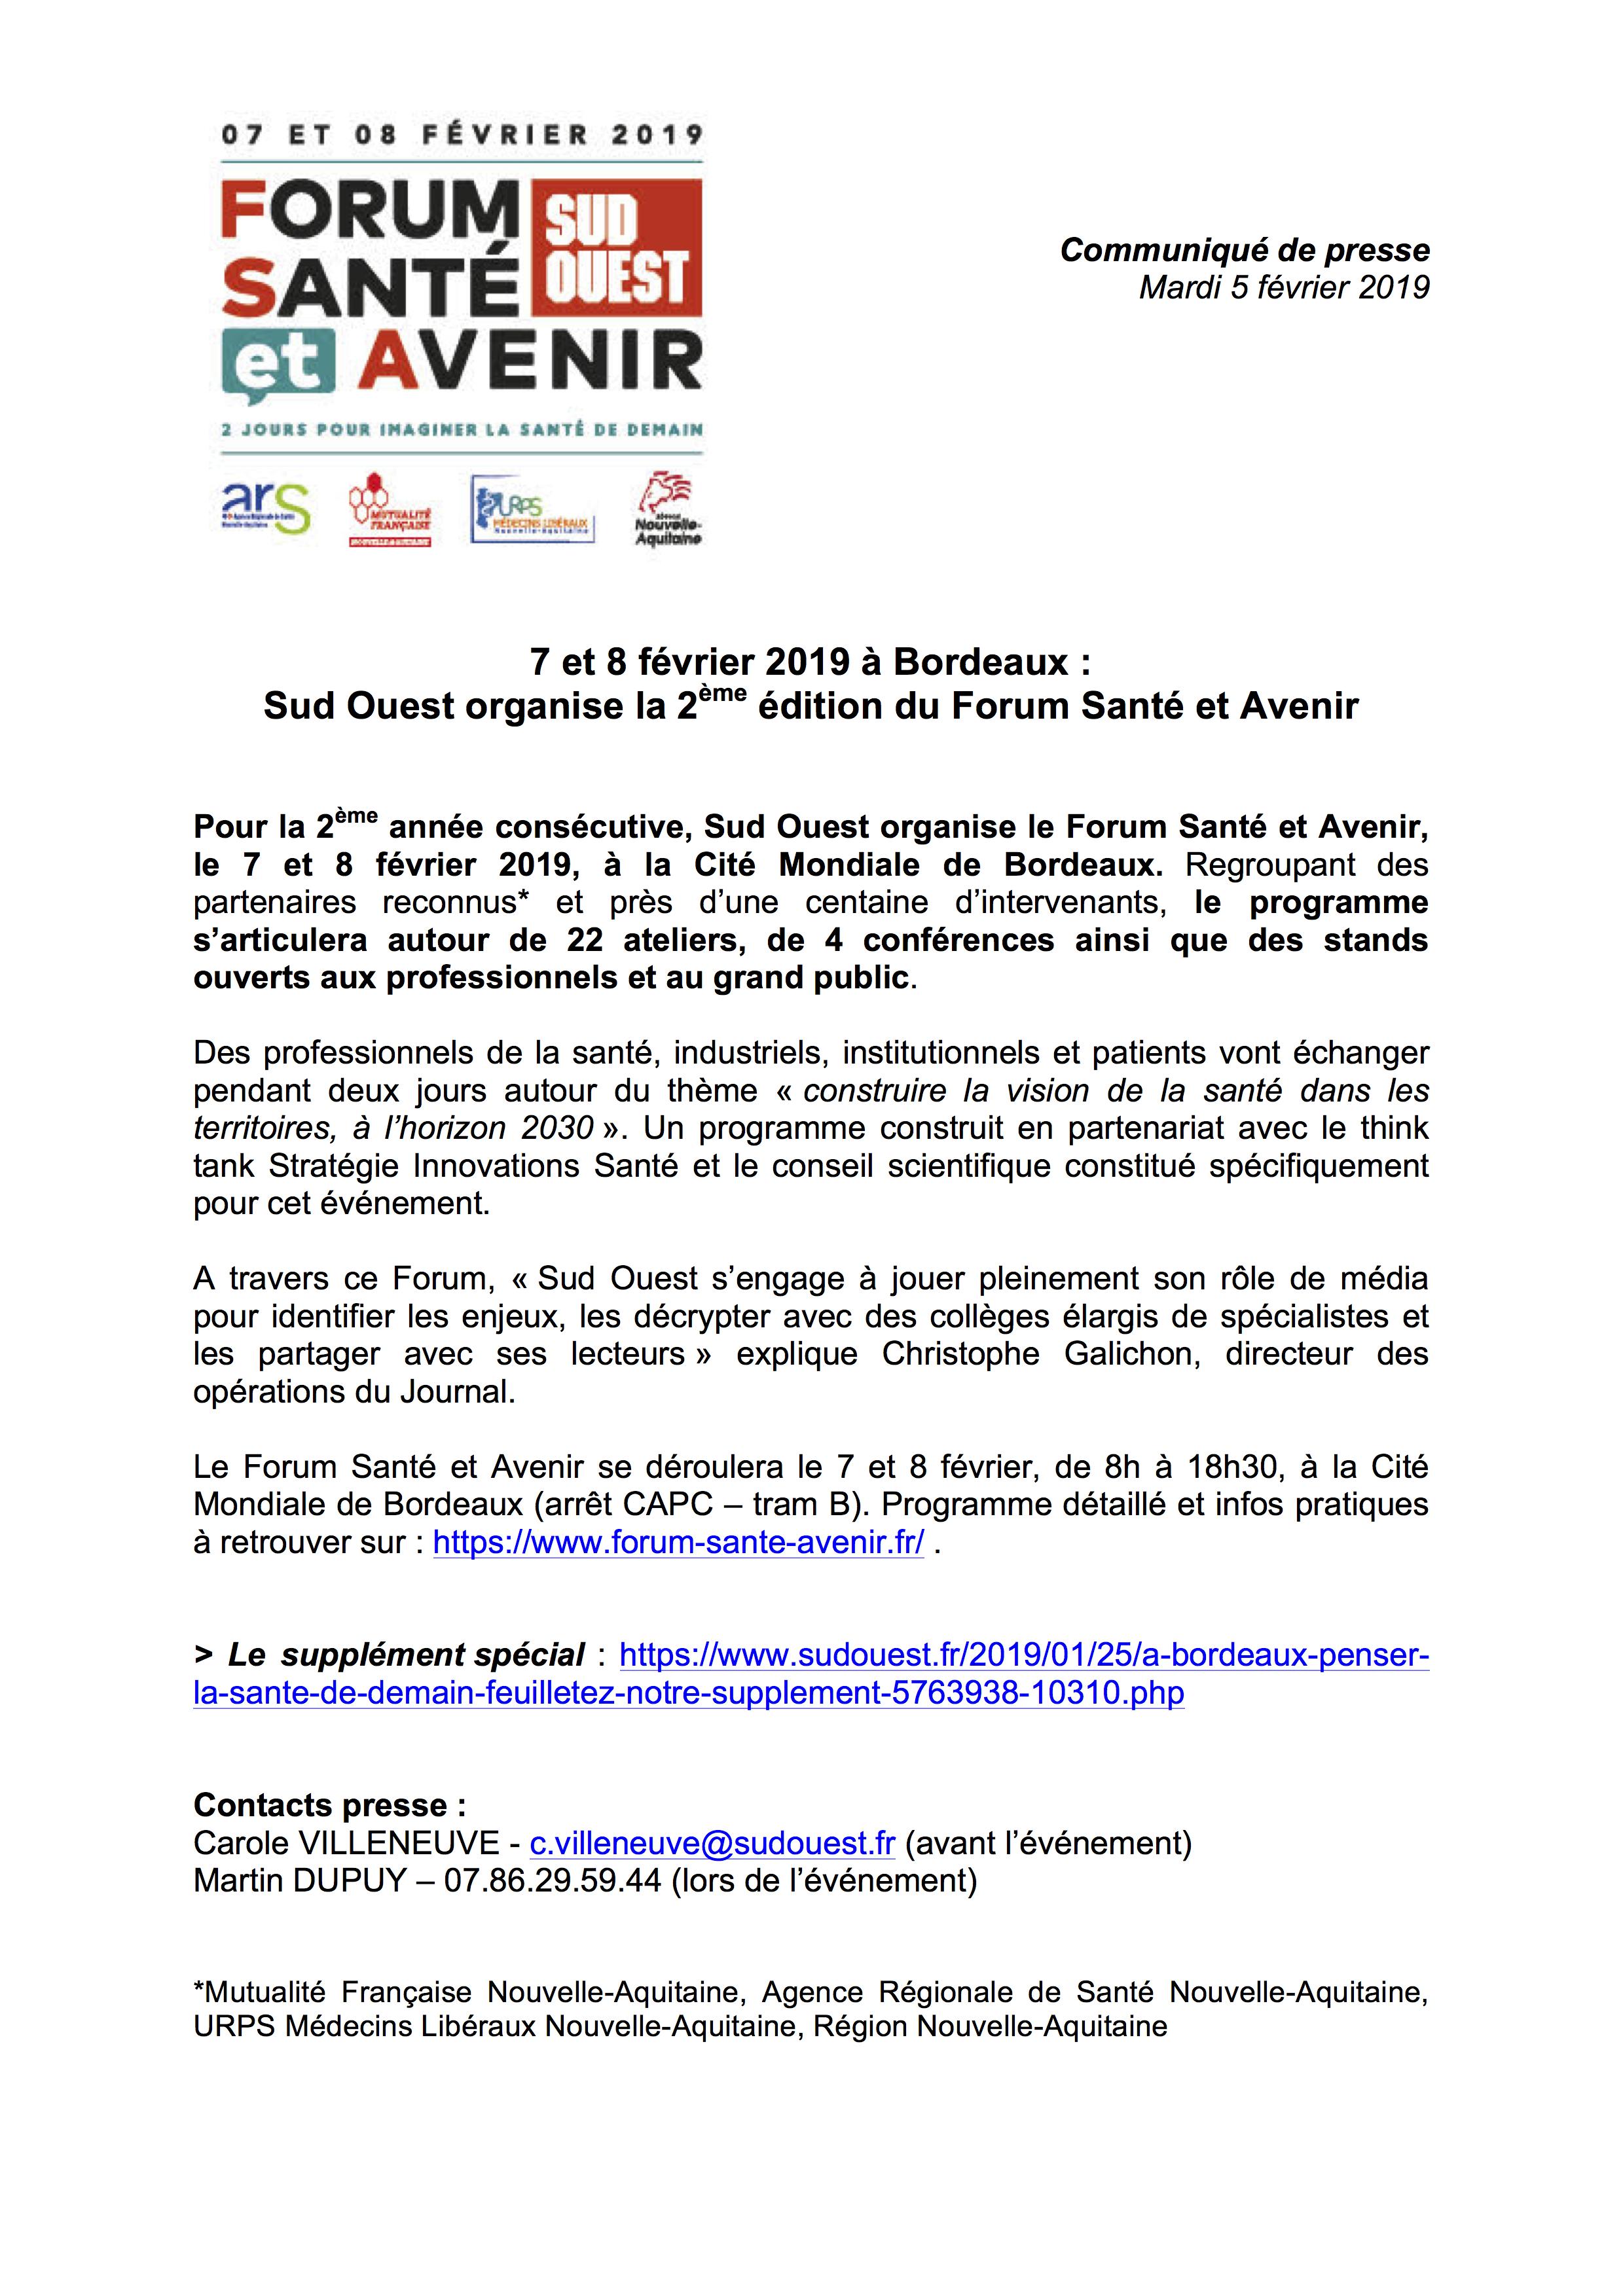 cp-forum-sante-et-avenir-2019